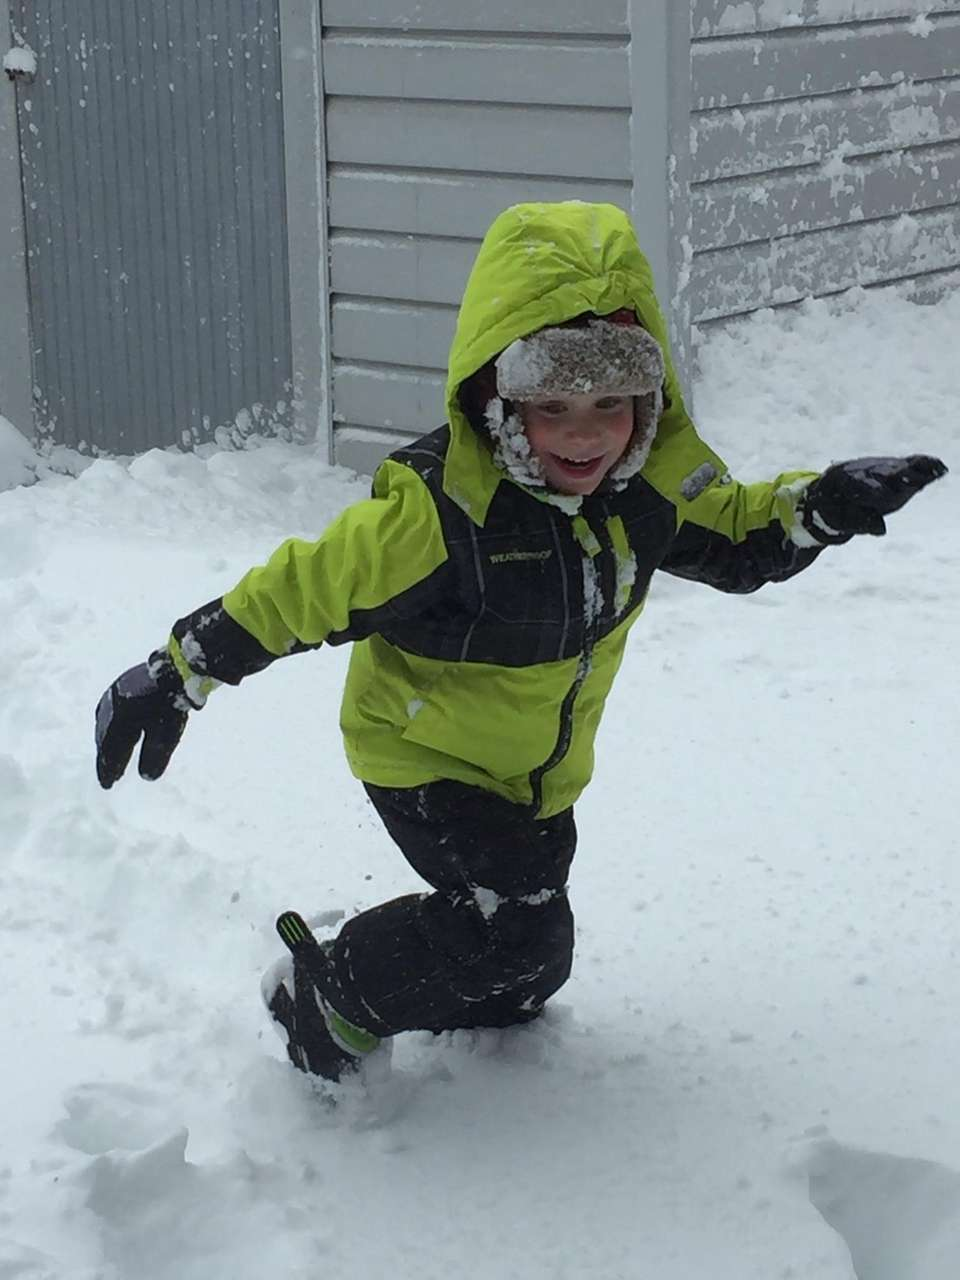 Thomas Neckin, 3, Running through the snow in